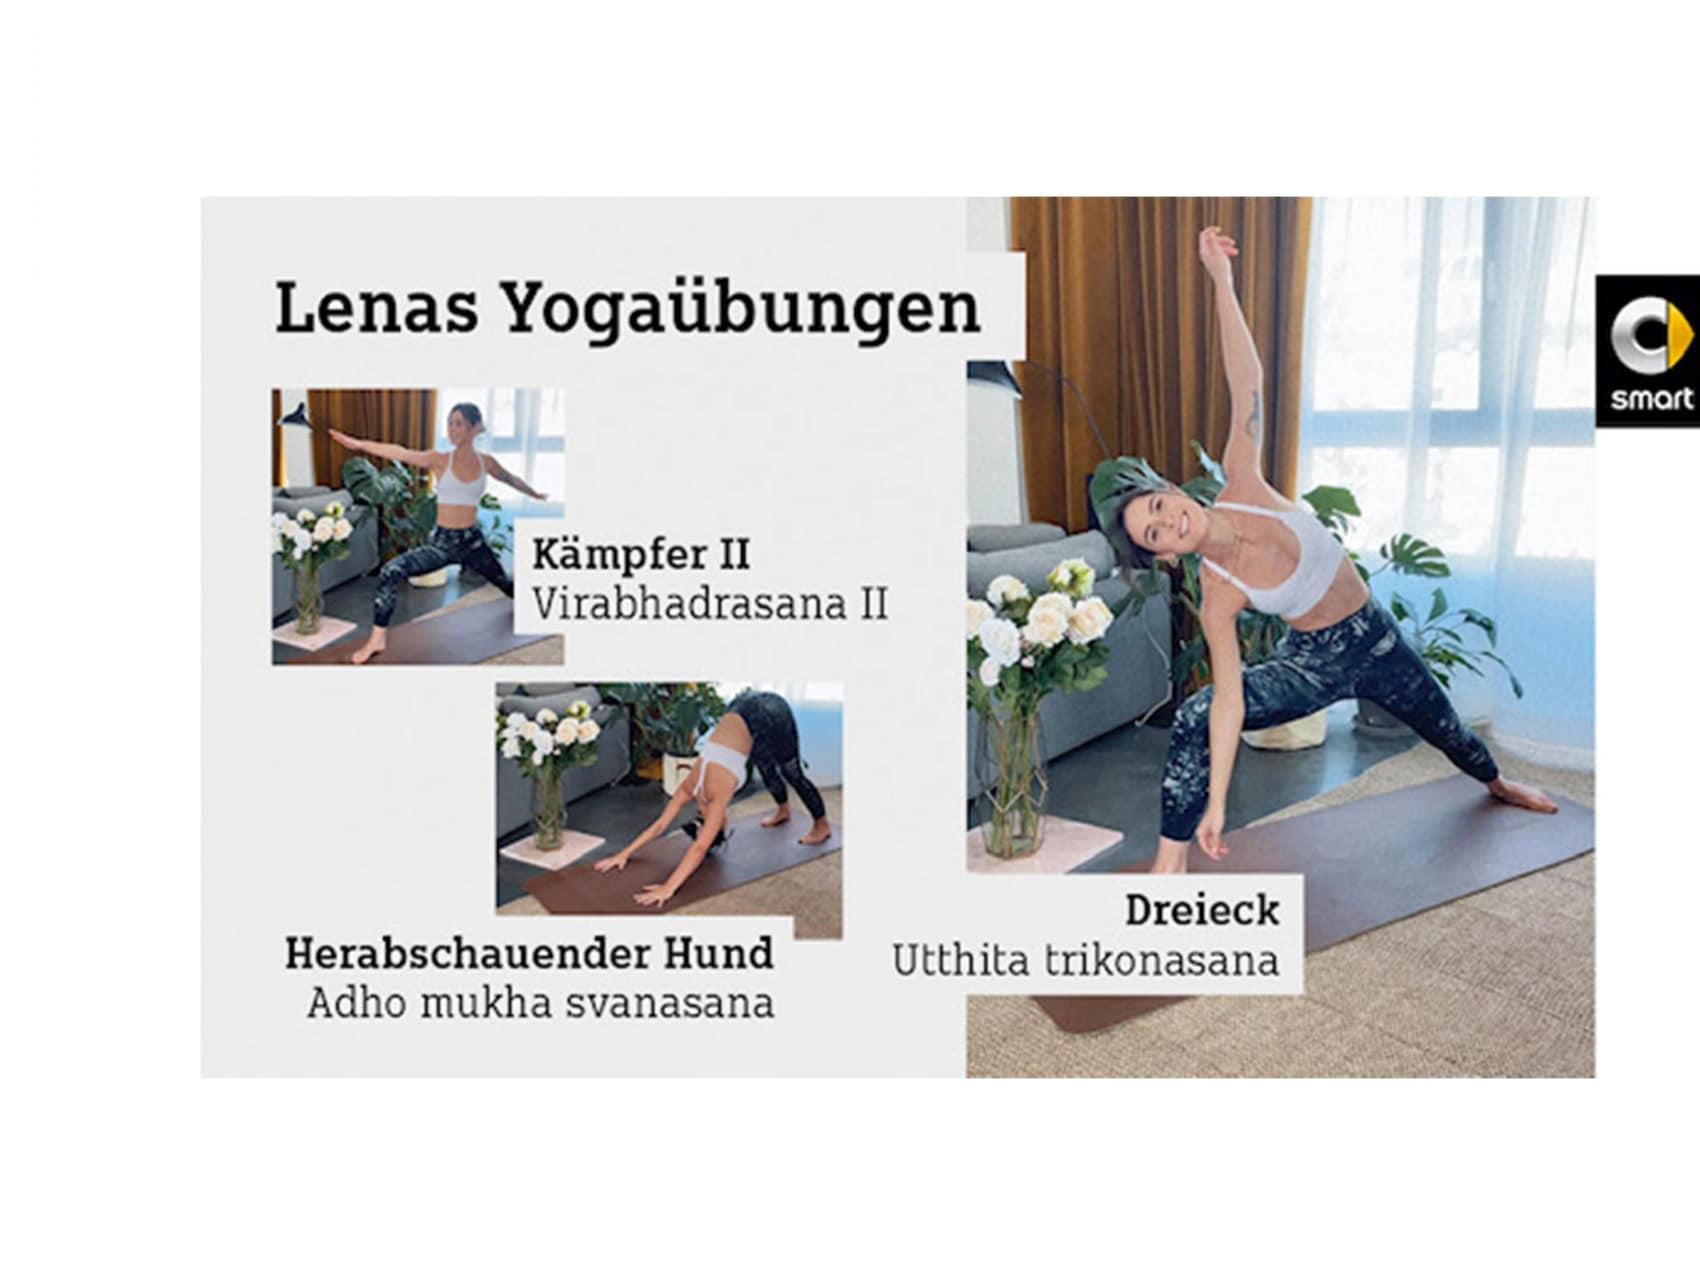 Lenas Yogauebungen